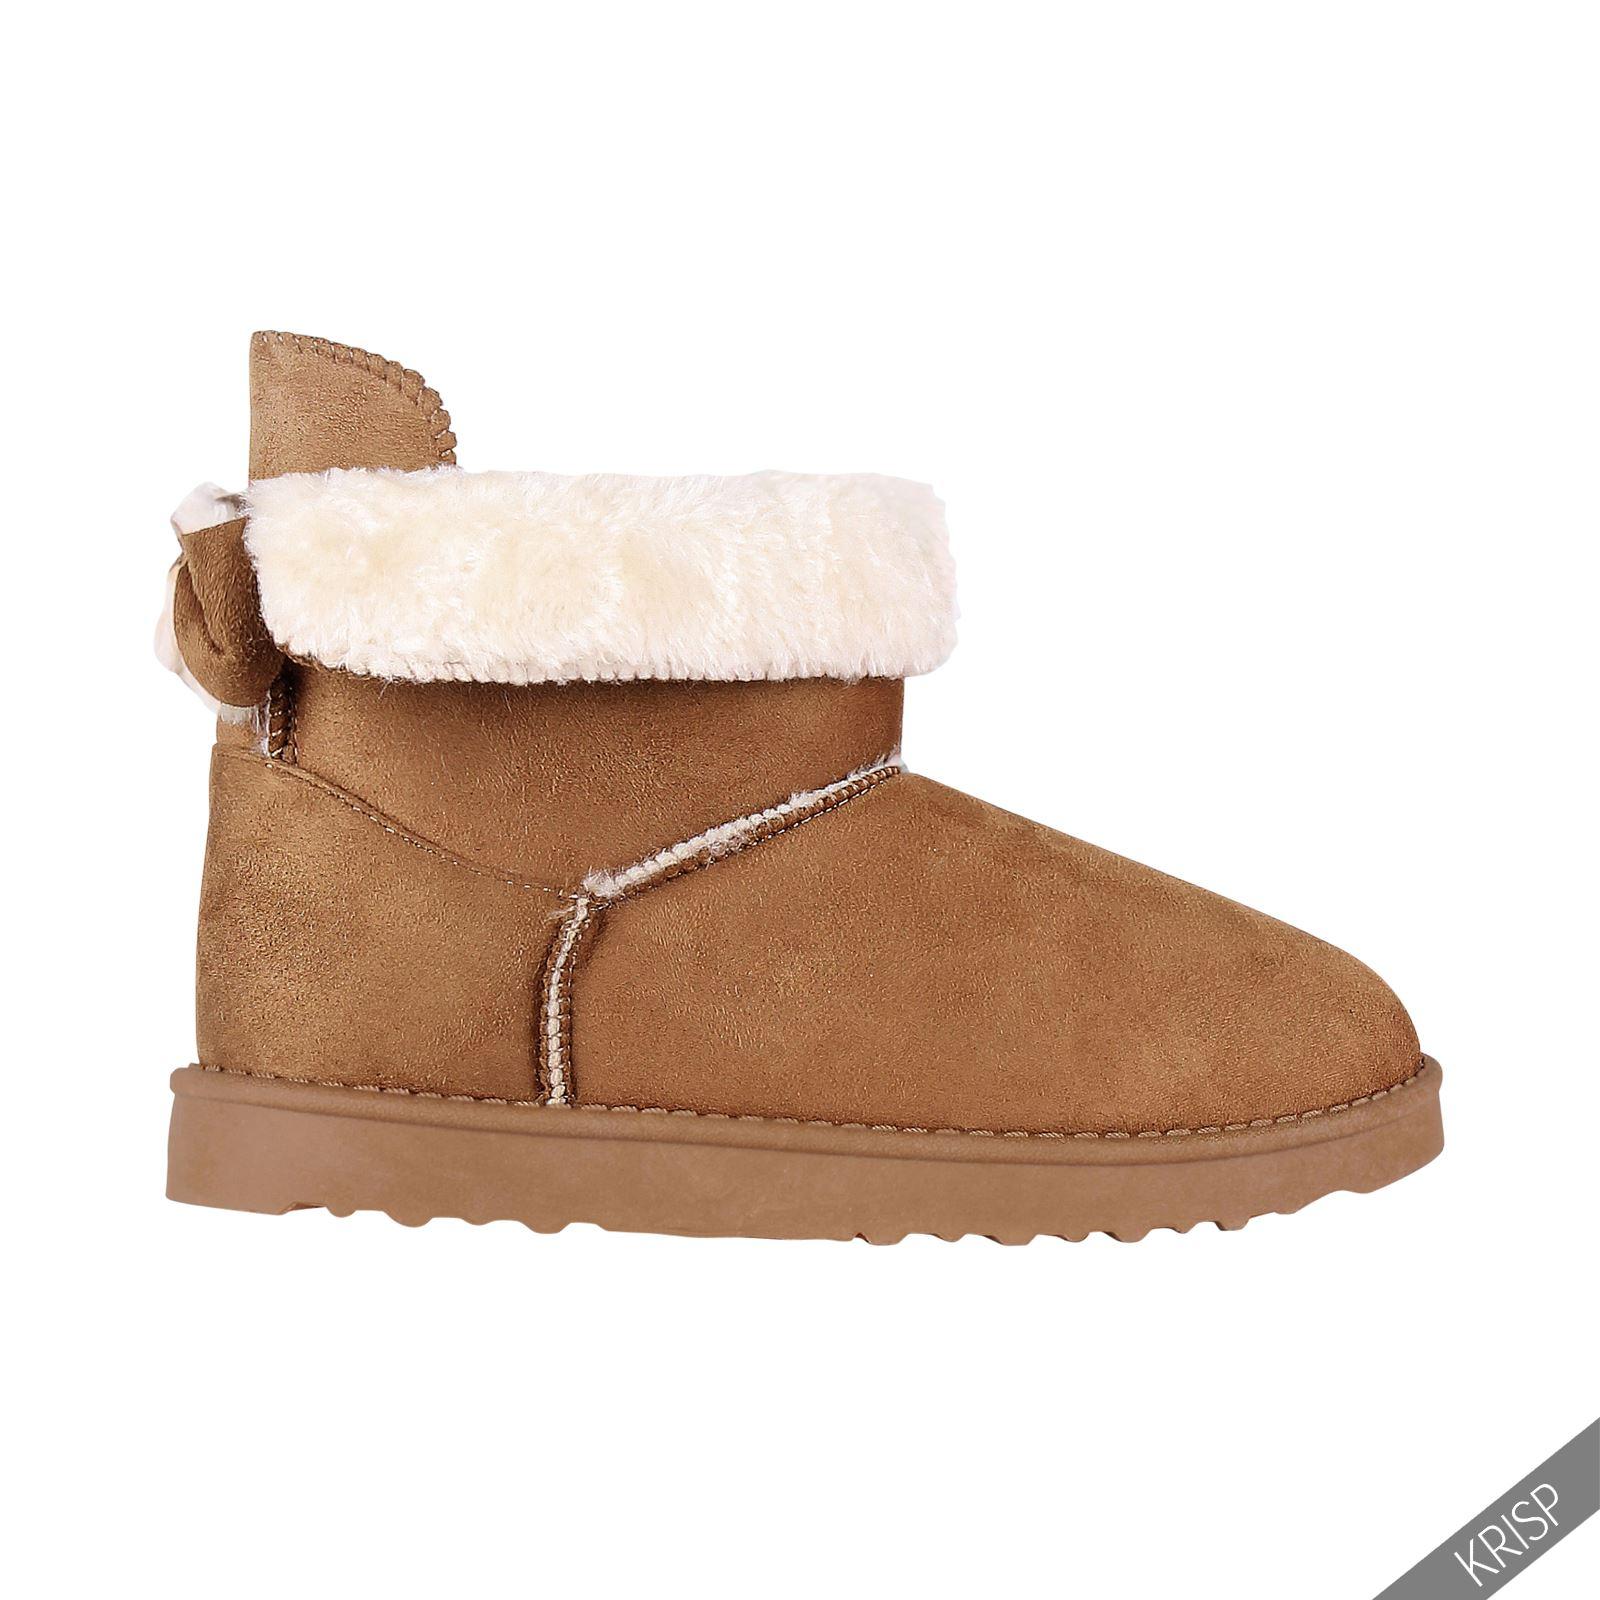 Womens Warm Fur Lined Snug Ankle Calf Boots Flat Ladies Winter Shoes Snow Ski | EBay